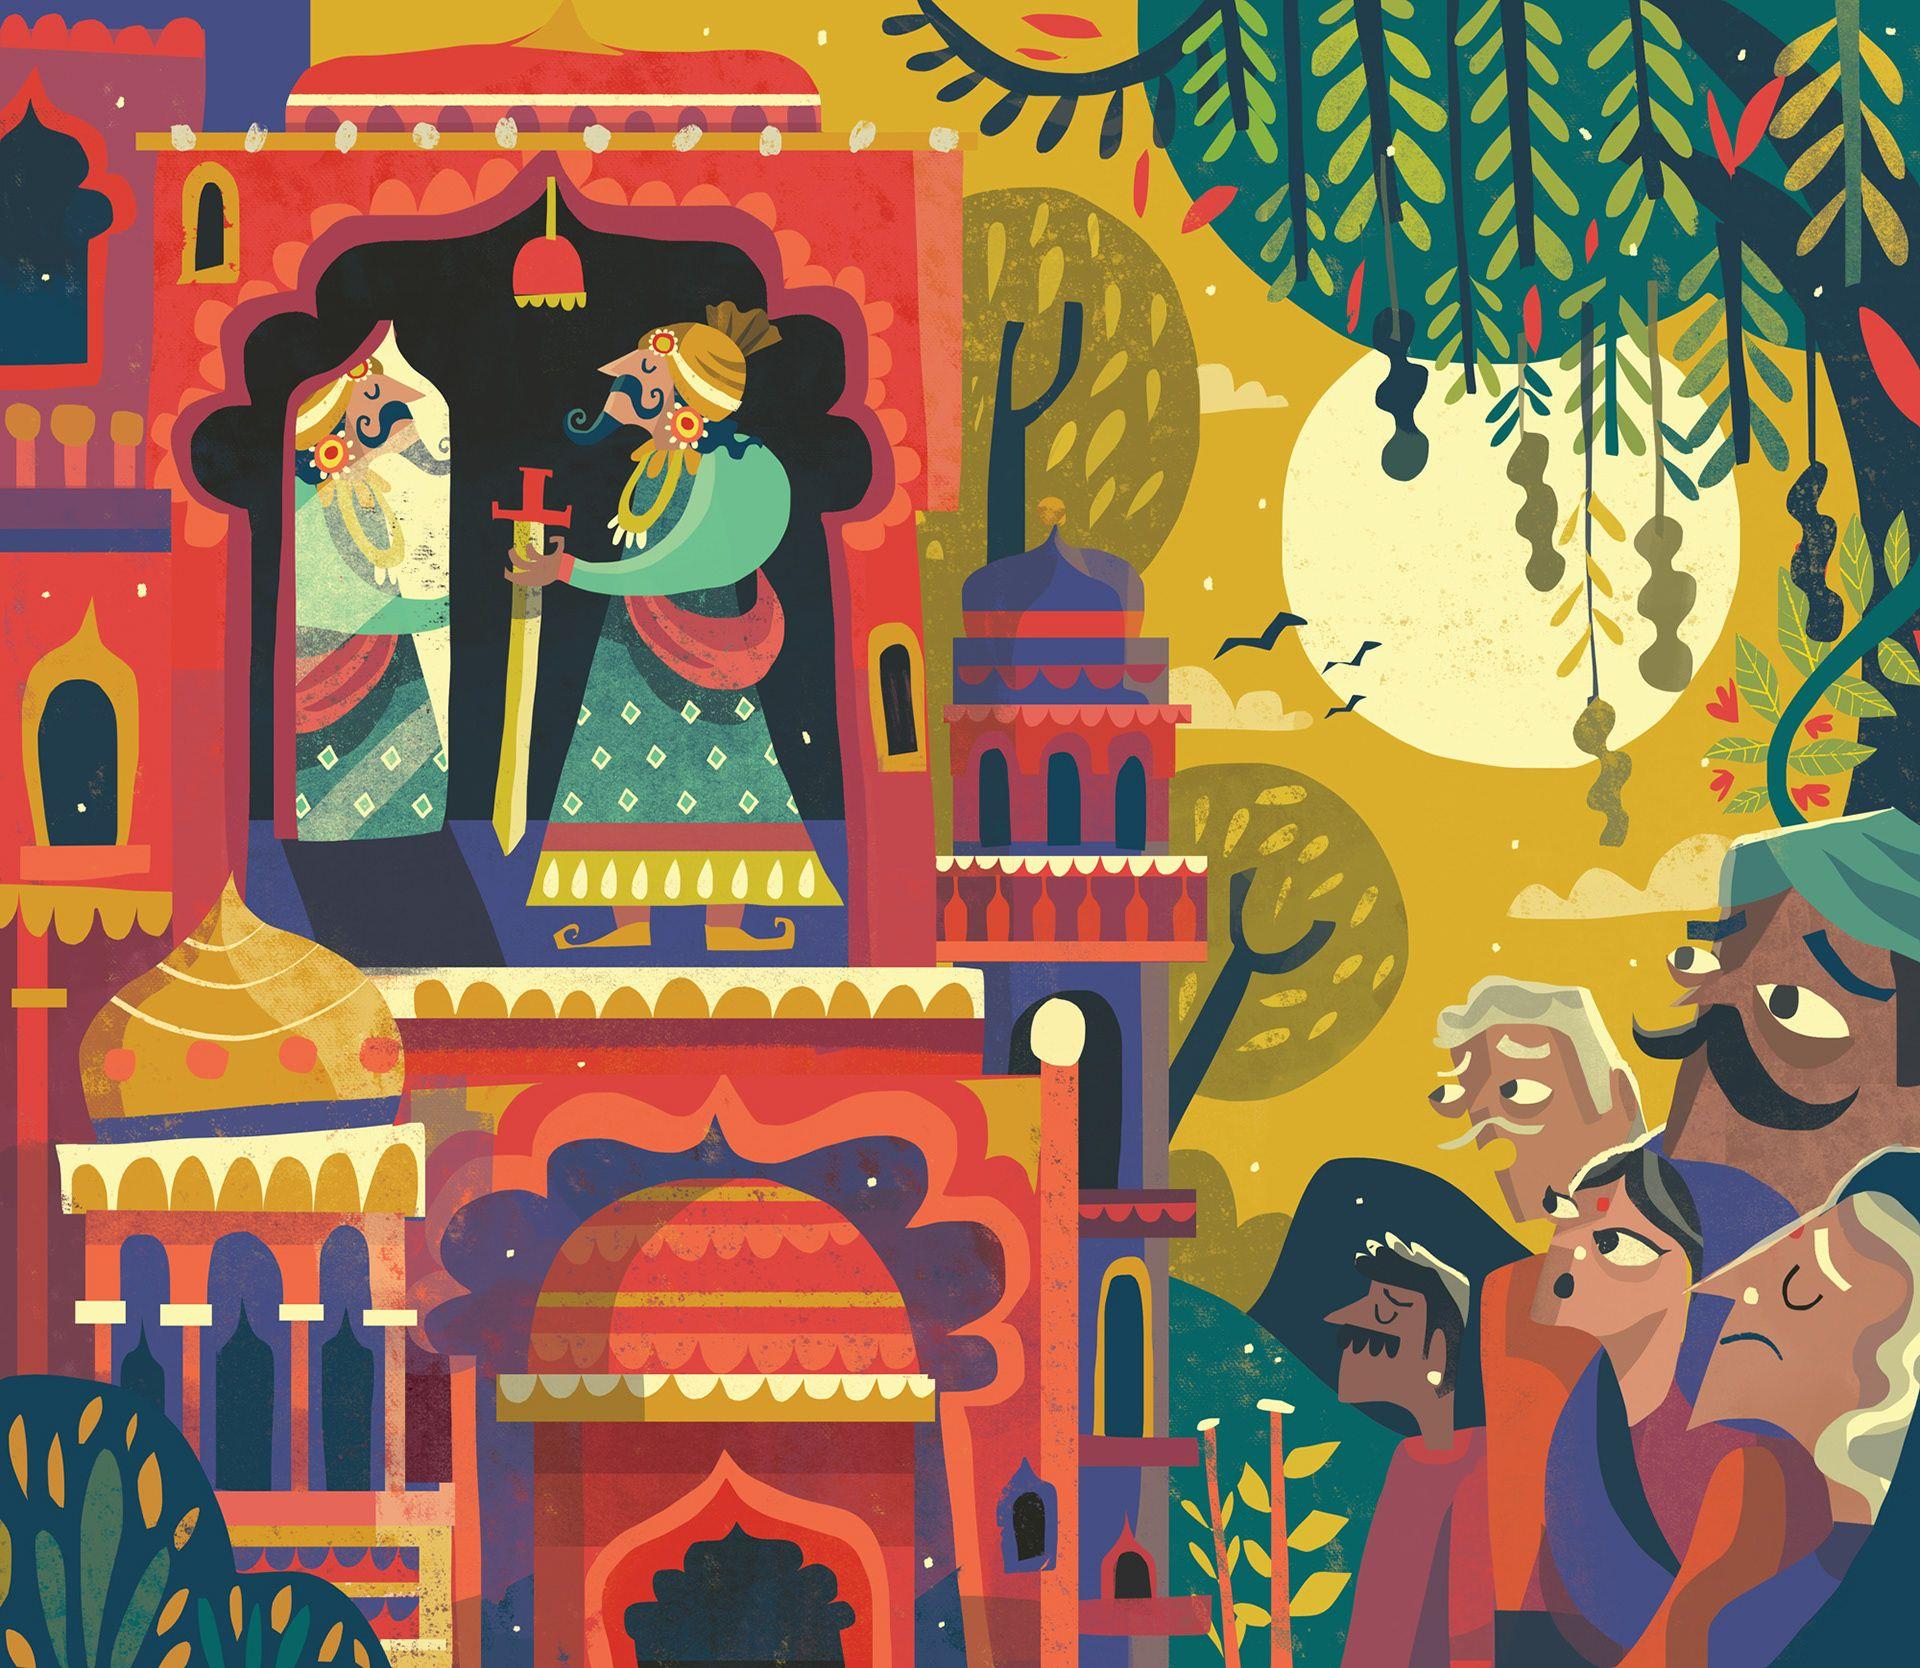 Colorful Illustrations By Chennai Based Illustrator Chaaya Prabhat Illustration Art Kids Folk Illustration Illustration